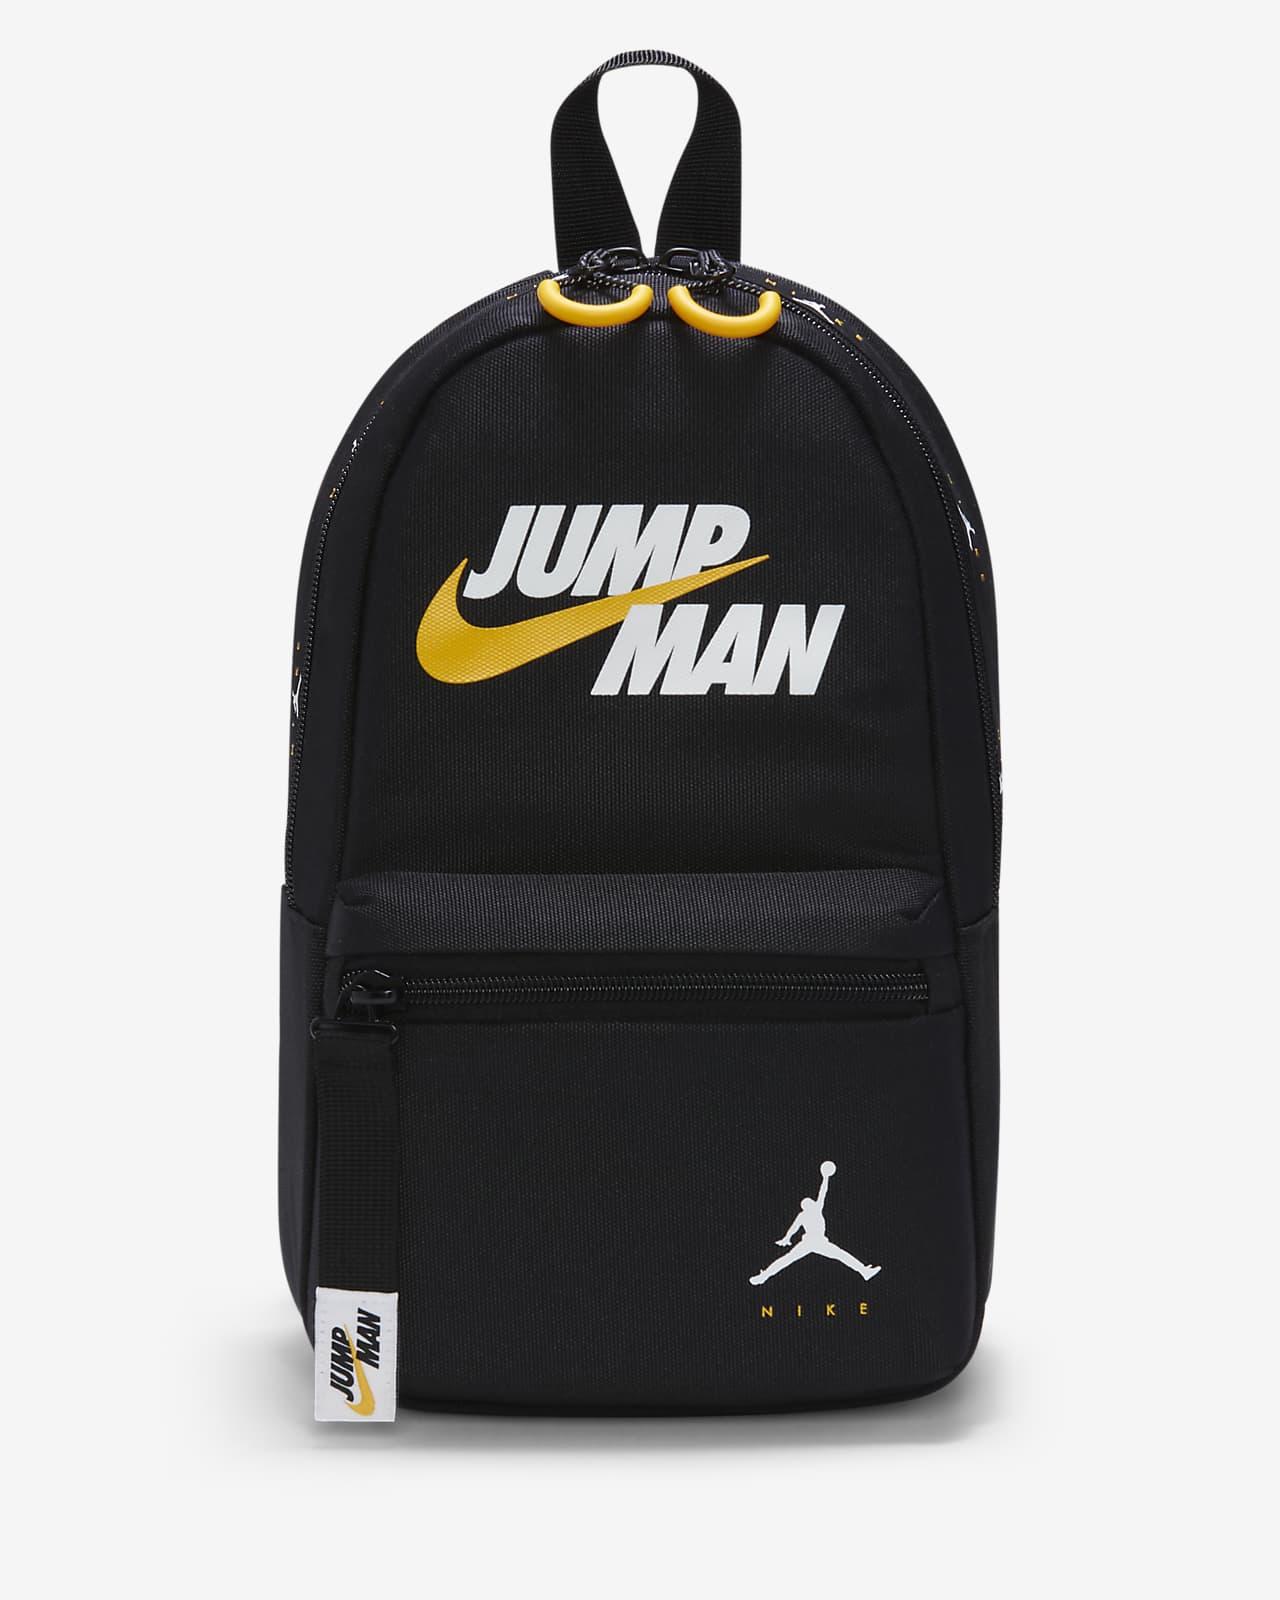 Jordan Backpack (Small)